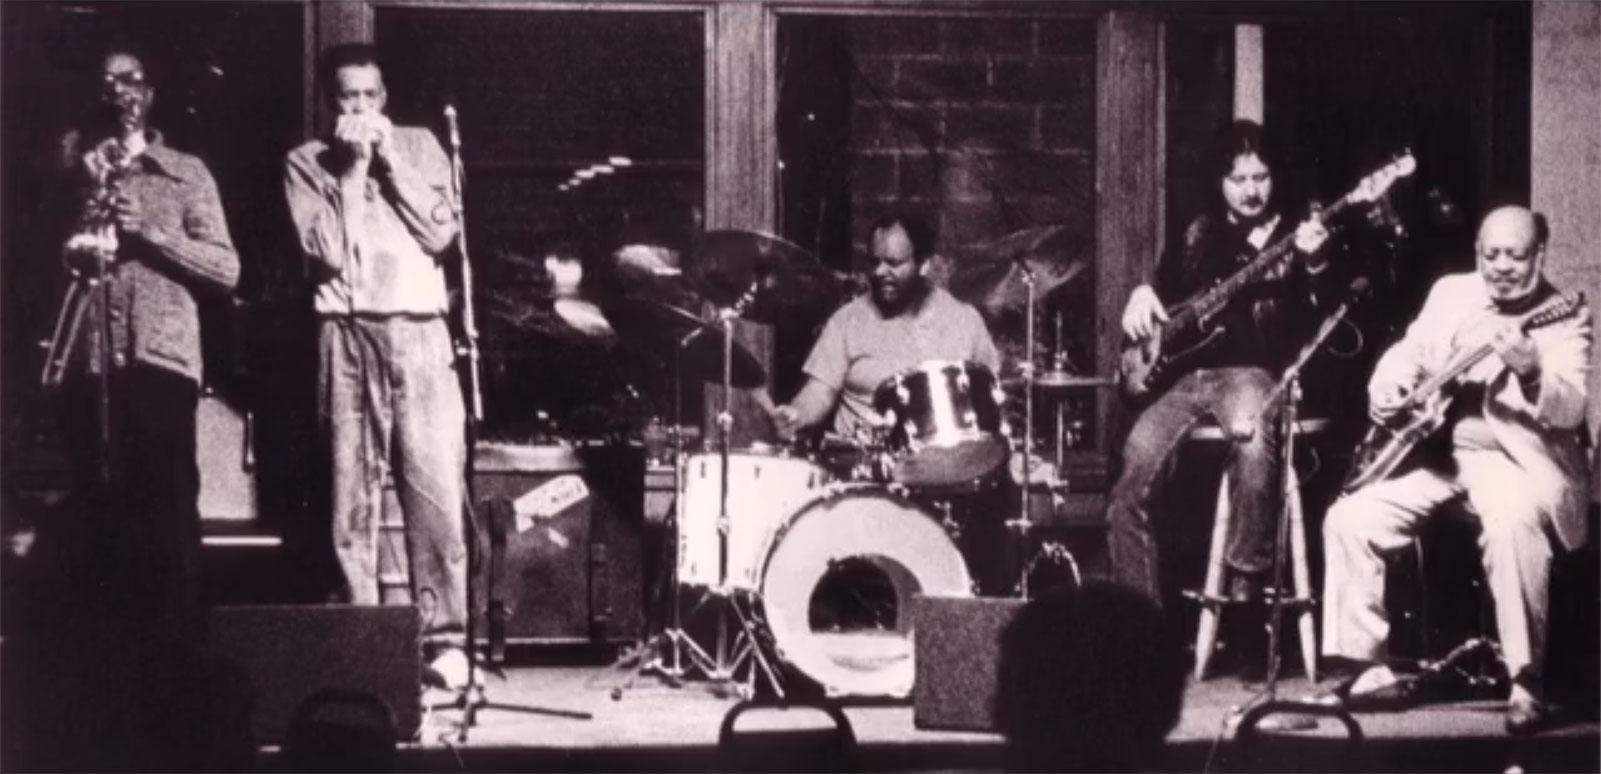 Robert Jr. Lockwood Band